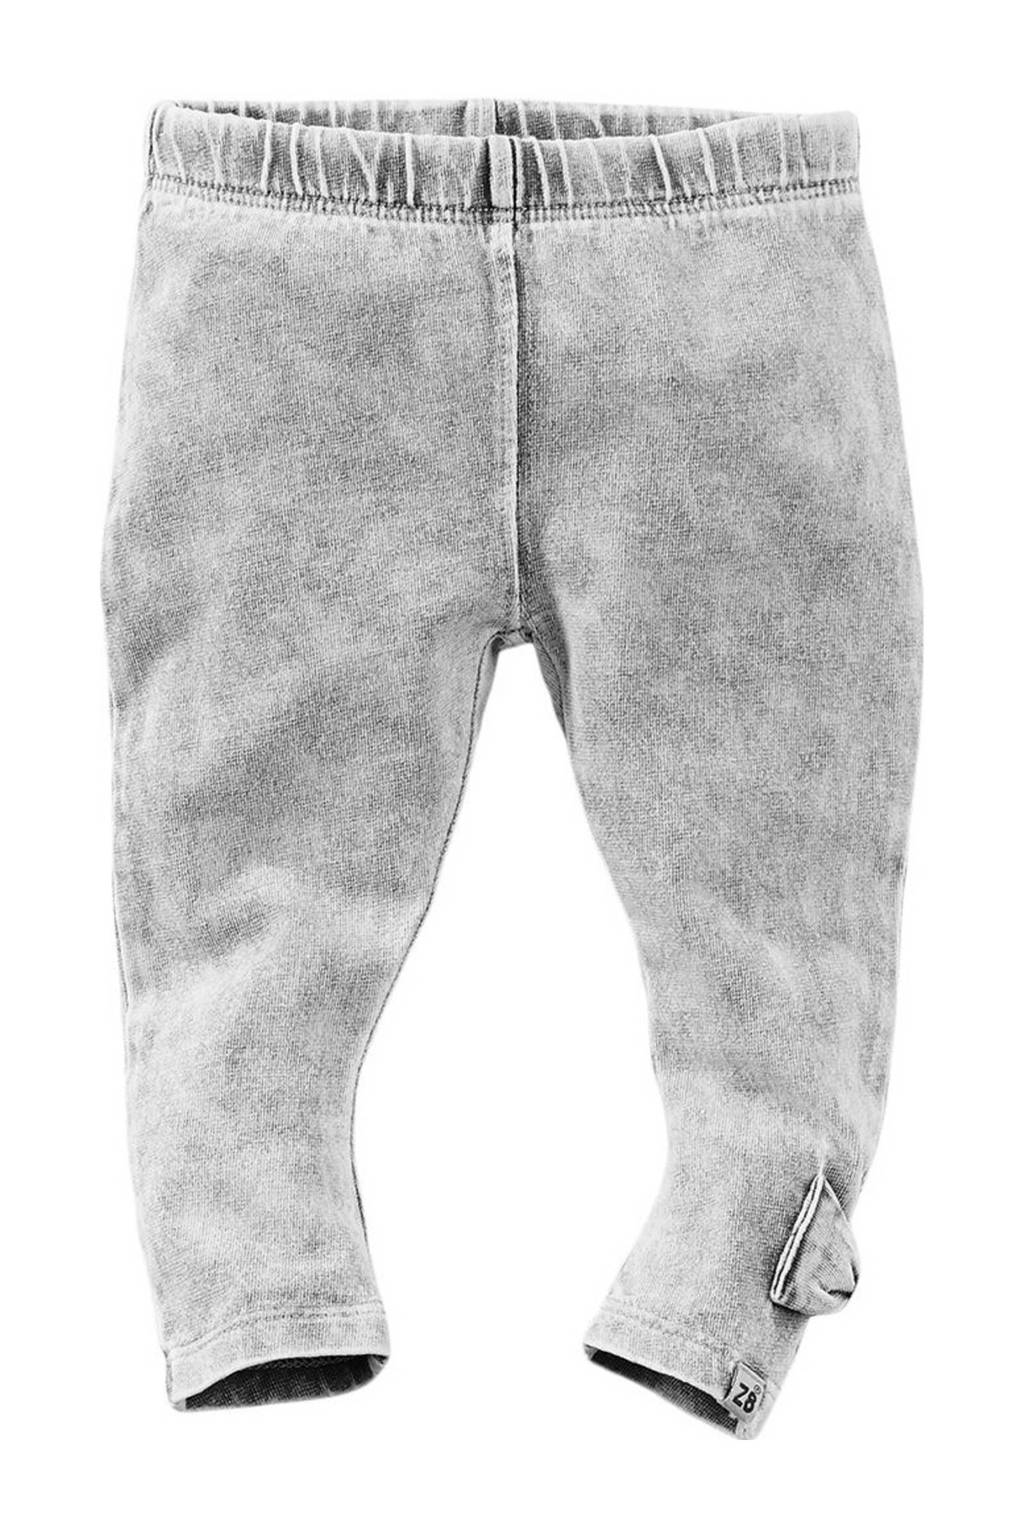 Z8 baby legging Mayfly W21 grijs, Grijs